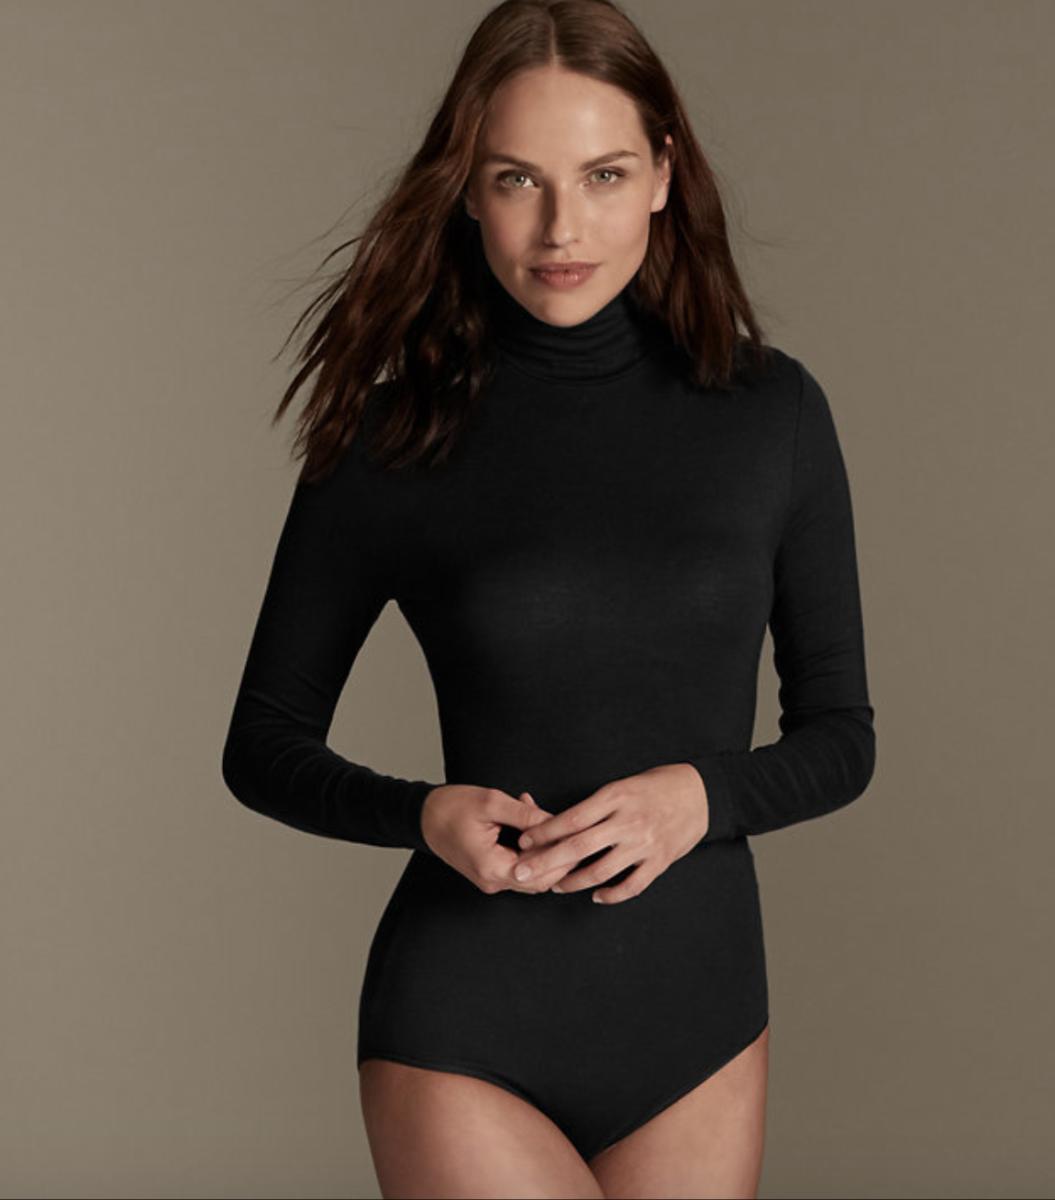 Review – M&S Heatgen Polo-neck Bodysuit: Lingerie For Men